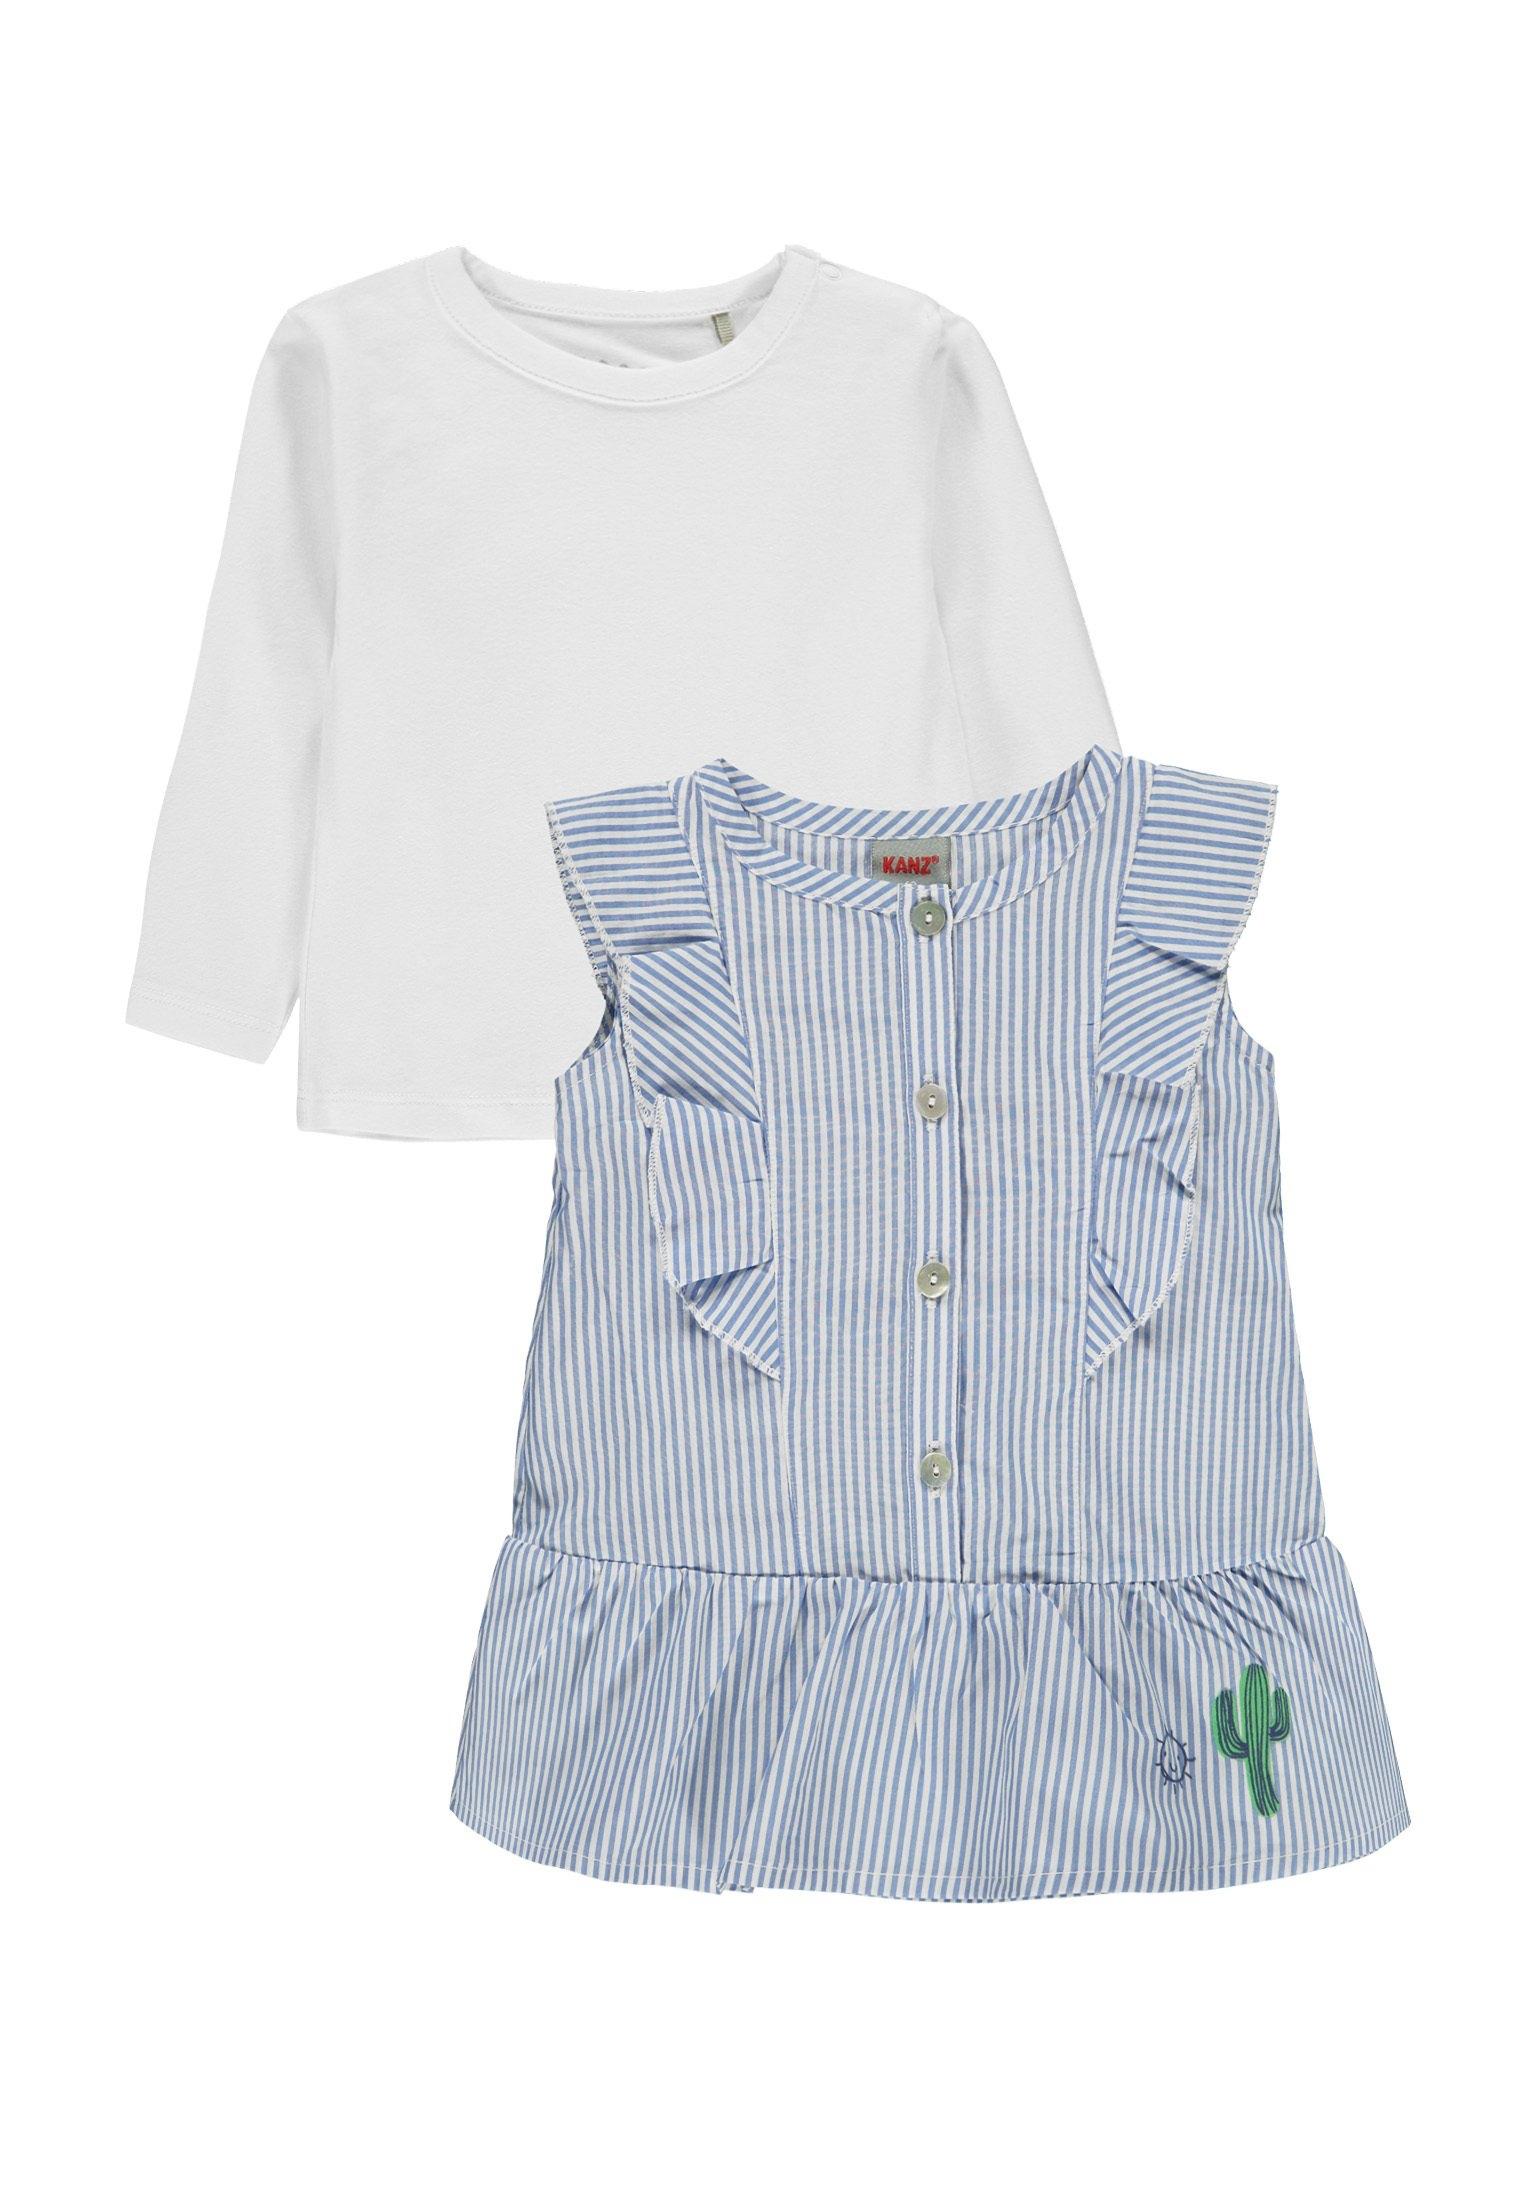 Kanz Set: jurk en shirt met lange mouwen 2-delig »Sunny«, (2) nu online bestellen